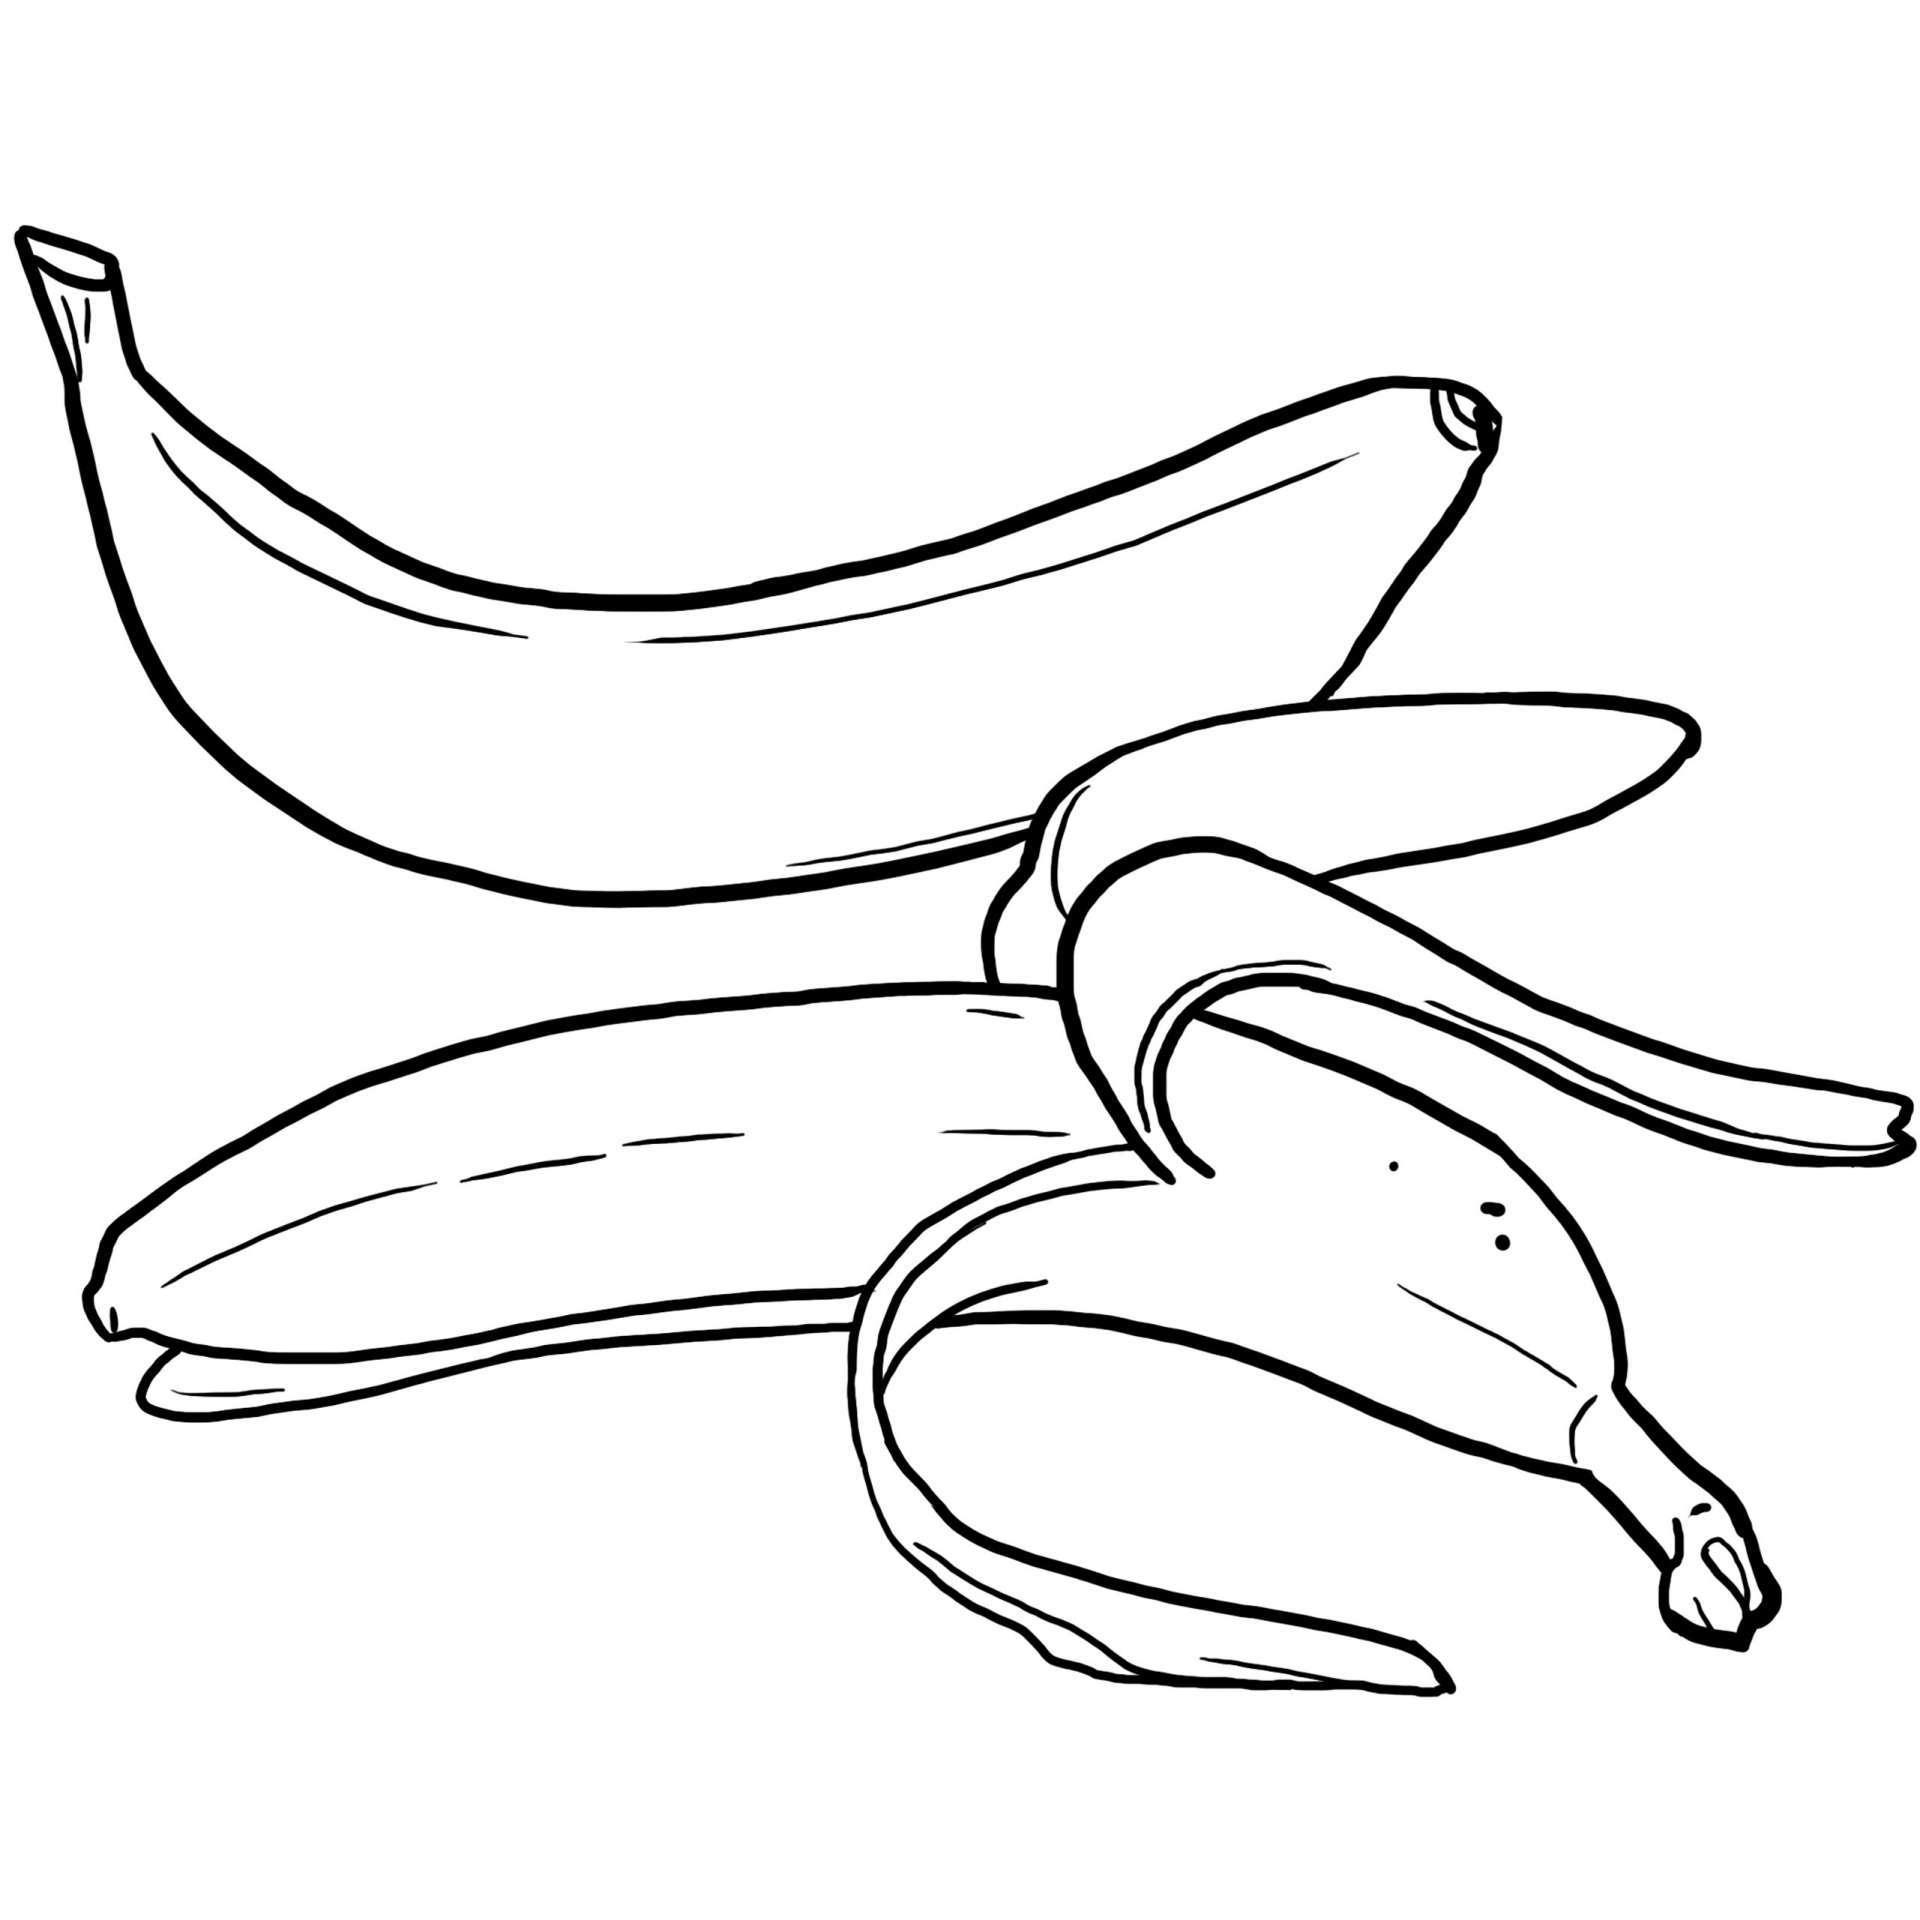 Impressionnant Image Banane A Colorier